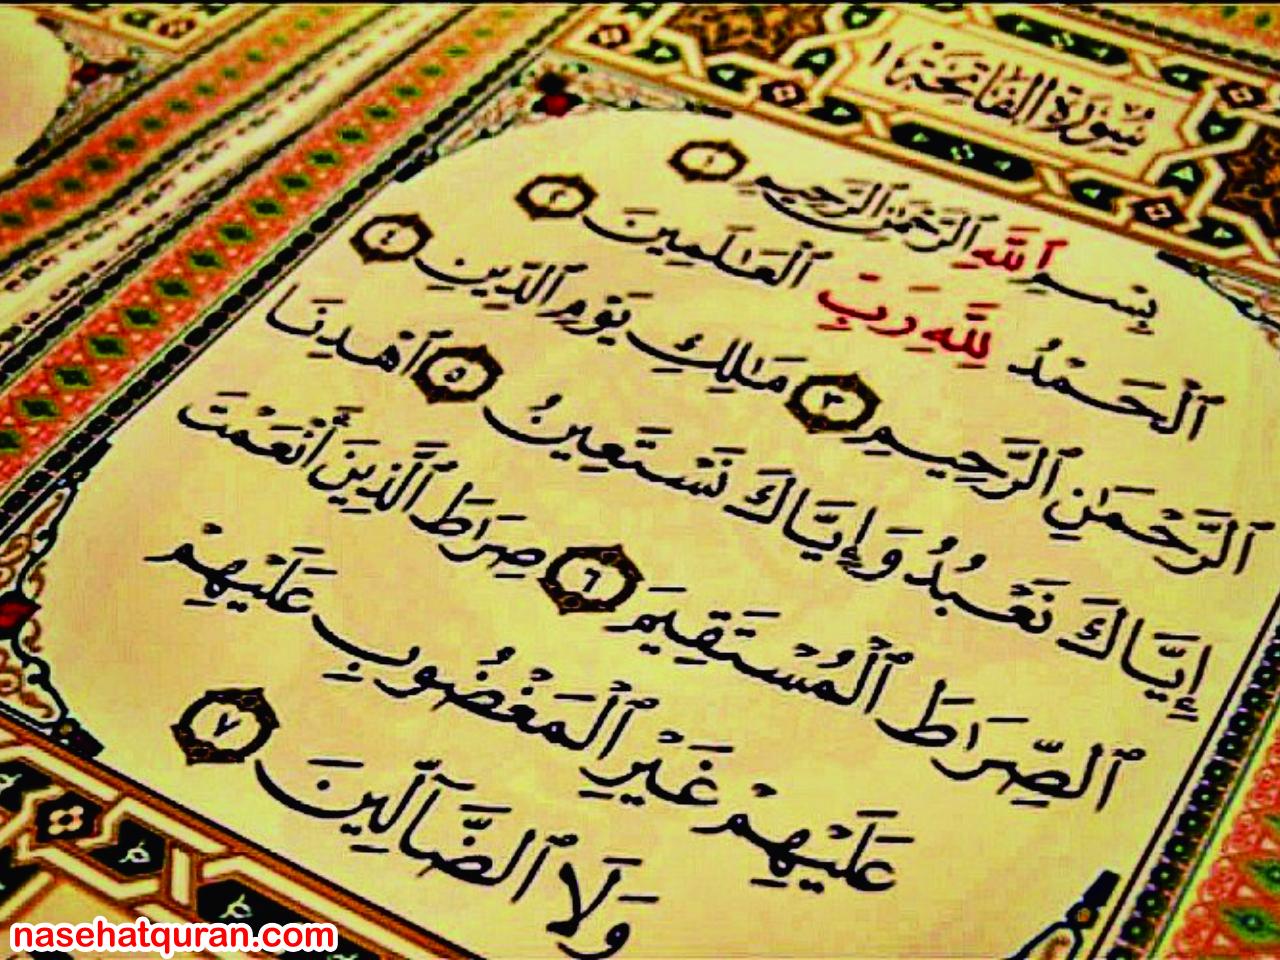 Khotbah Jum'at : Tadabbur Surah Yang Disebut Sebagai Ummul Quran (Induknya Al-Quran)